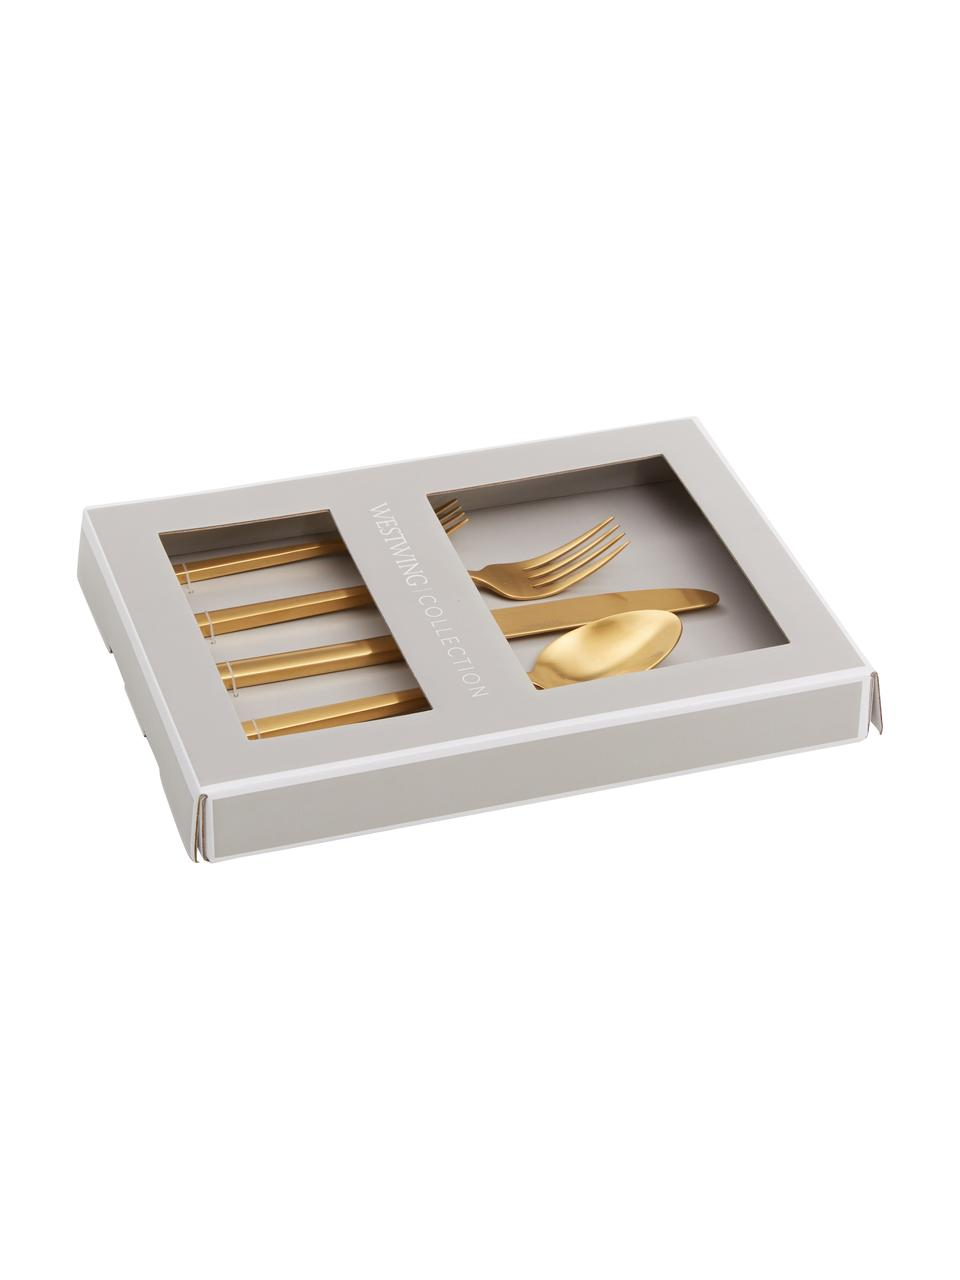 Set di posate dorate in acciaio inossidabile Shine, Coltello: acciaio inossidabile 13/0, Dorato, 1 persona (5 pz.)